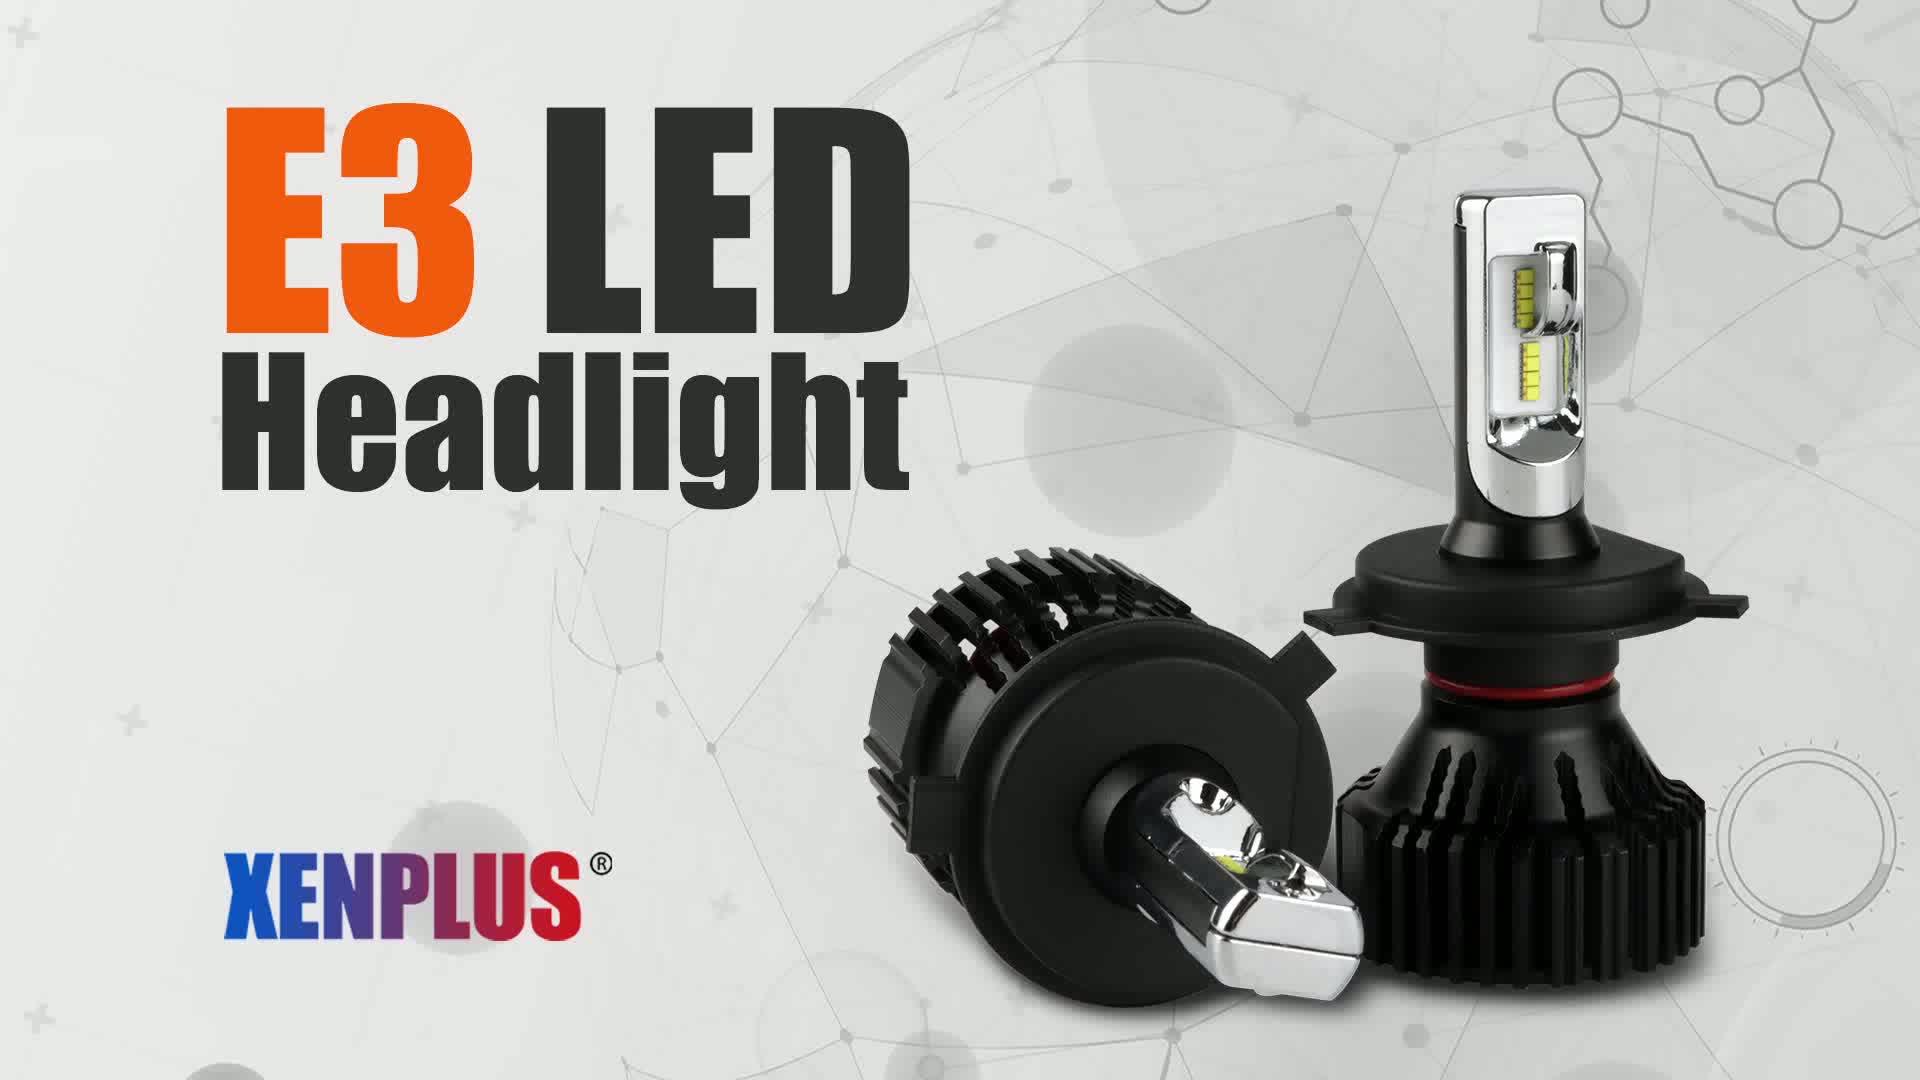 Zes Chip Car Head Lamp E3 Led Headlight Auto Car PSX26 led headlight